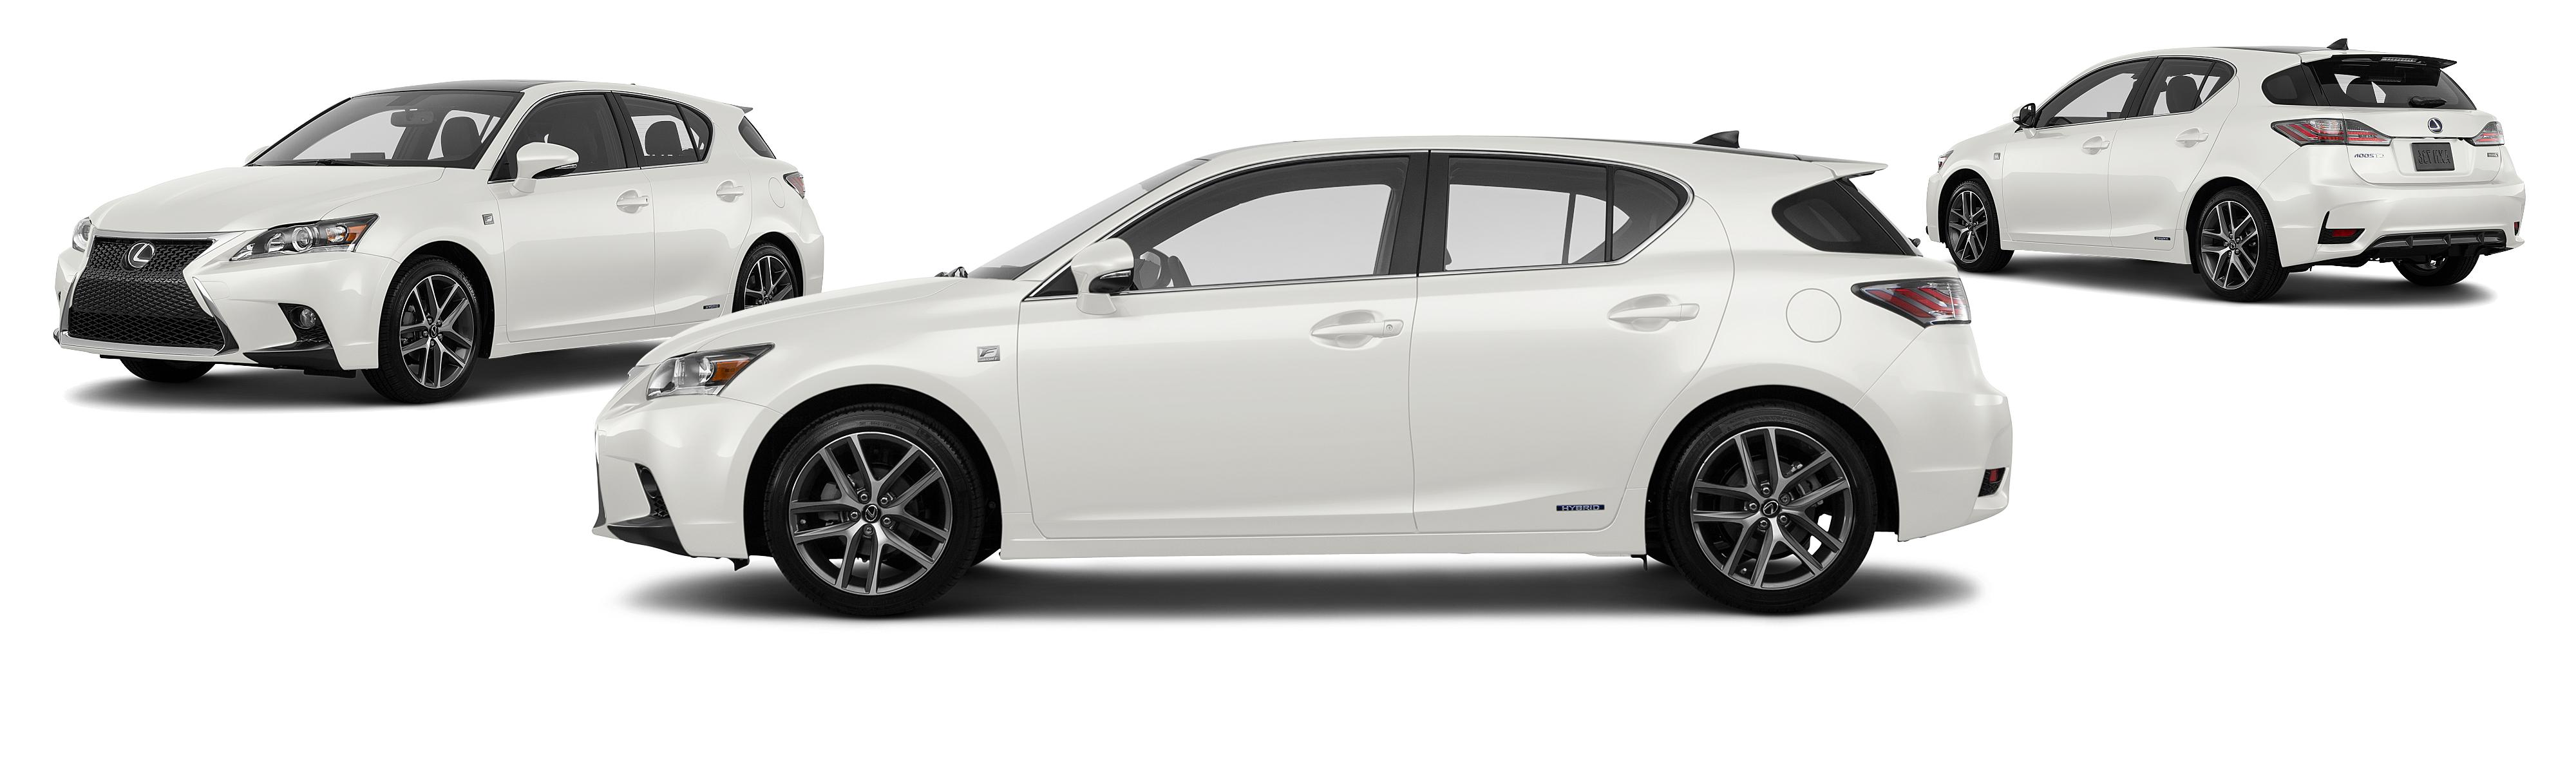 2017 Lexus CT 200h 4dr Hatchback Research GrooveCar